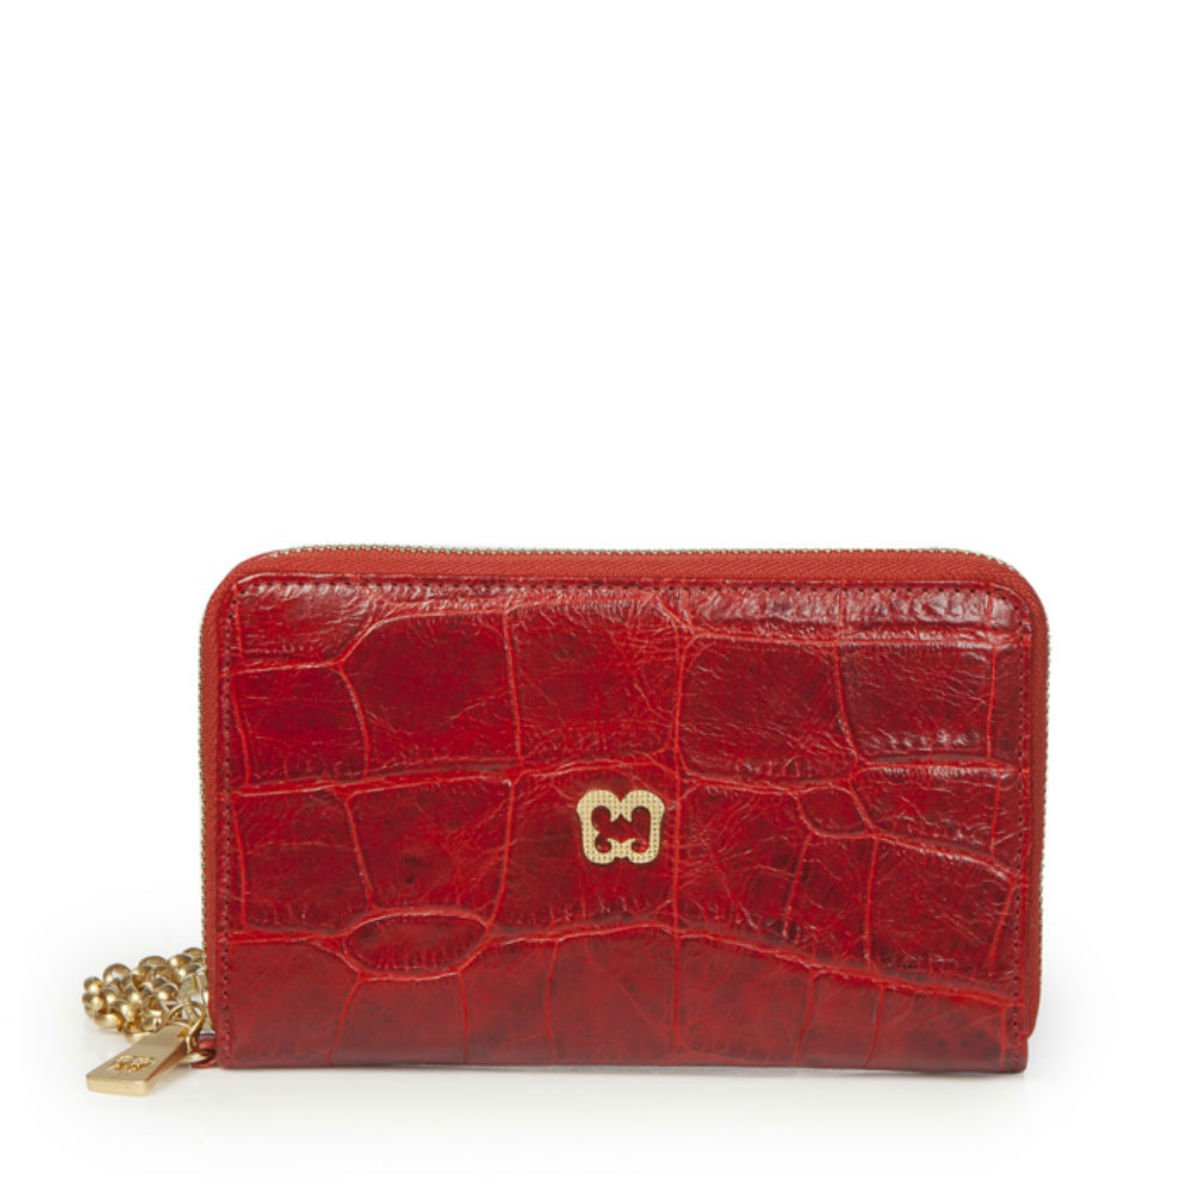 Eric Javits Luxury Fashion Designer Women's Handbag - Smartphone Wristlet - Red